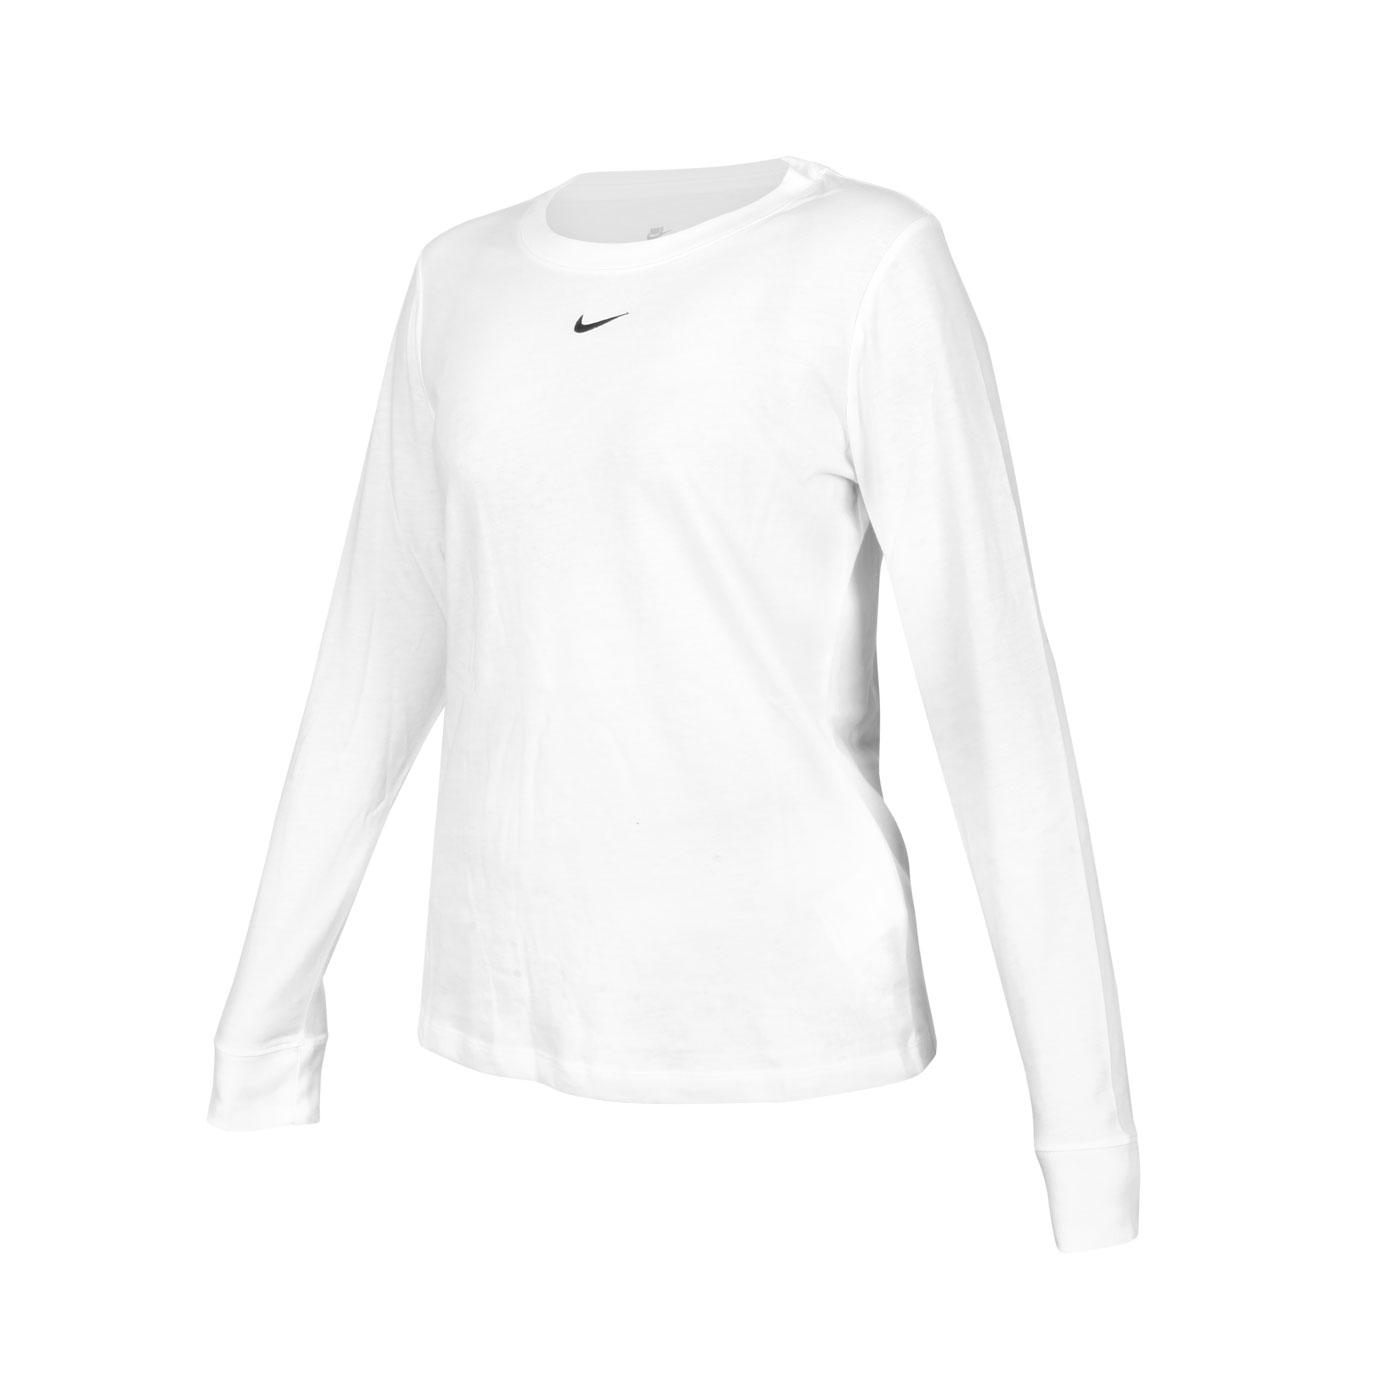 NIKE 女款長袖T恤 DC9834-100 - 白黑